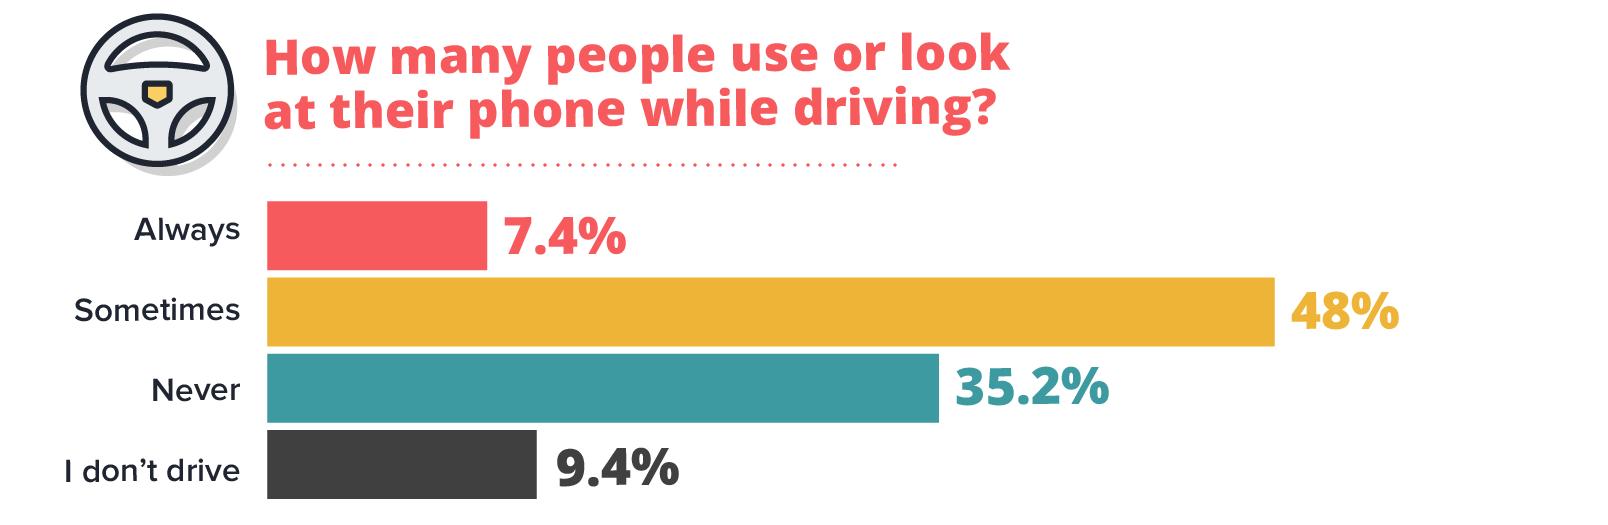 Smartphones High Usage